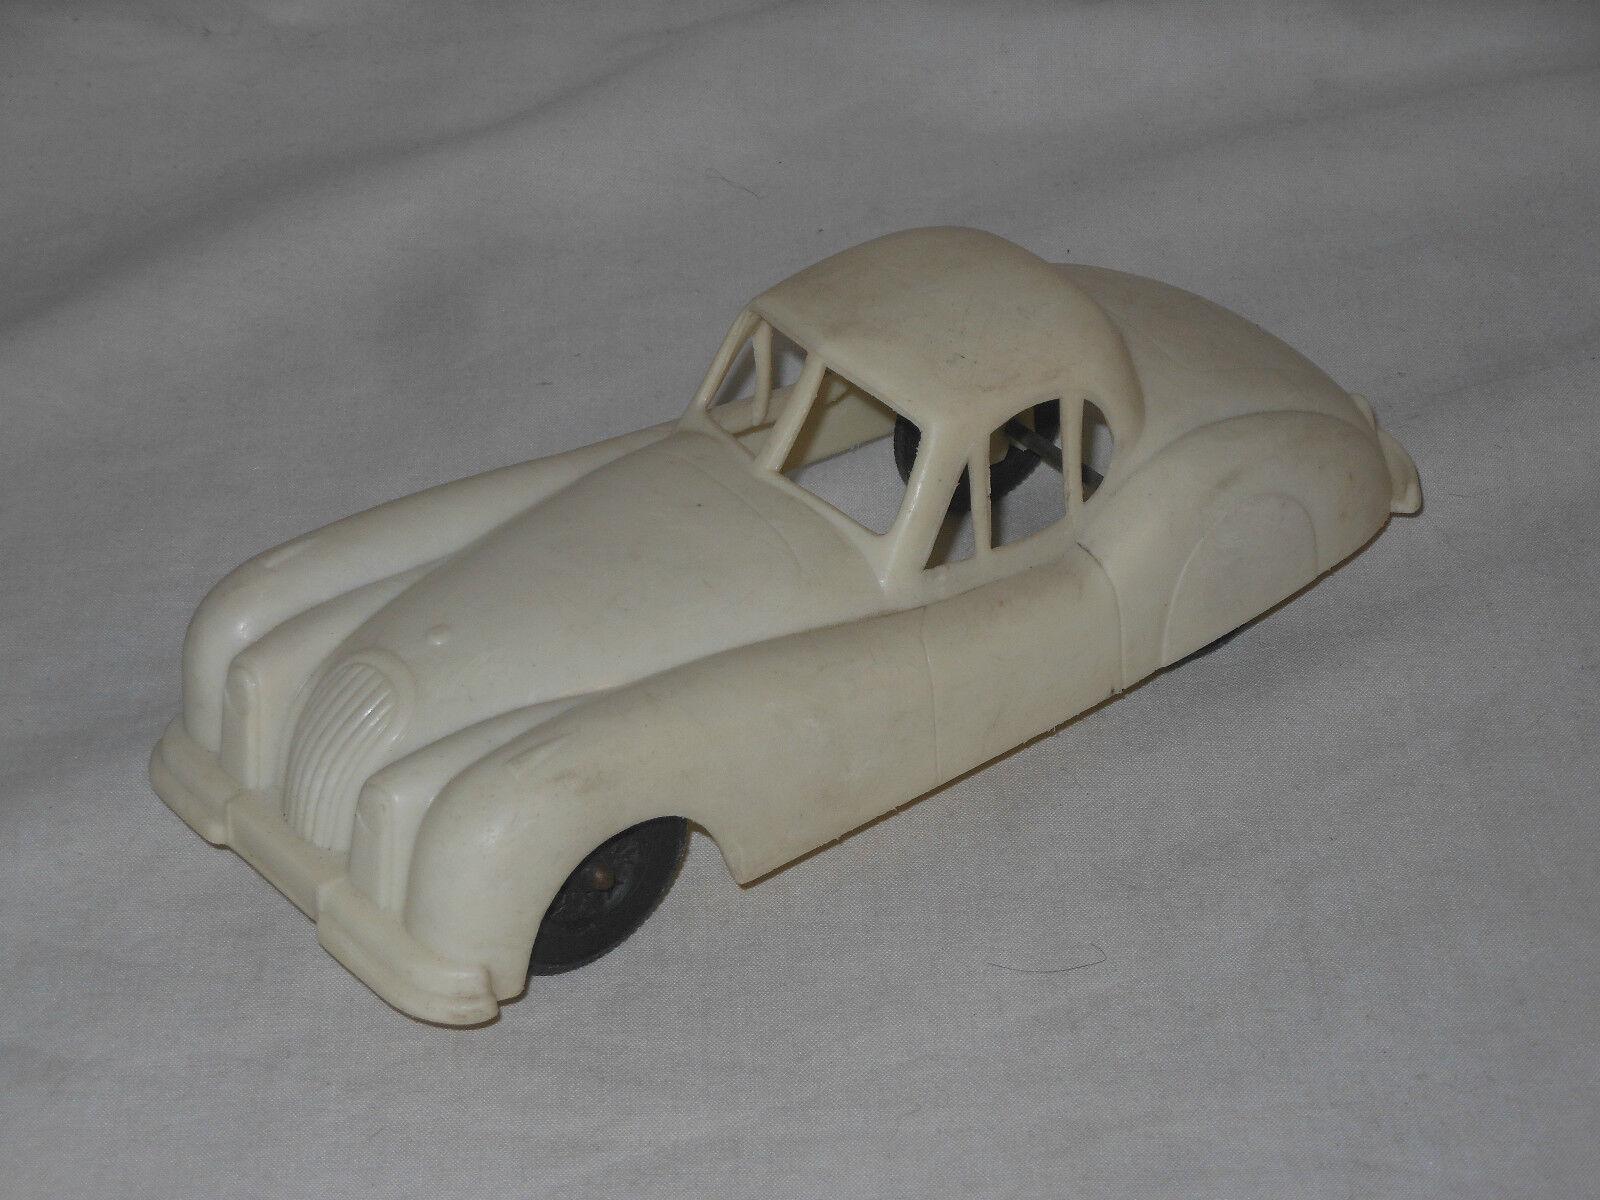 Vintage Toy Car - JAGUAR - 20 cm - Made in Germany - 50èr Years